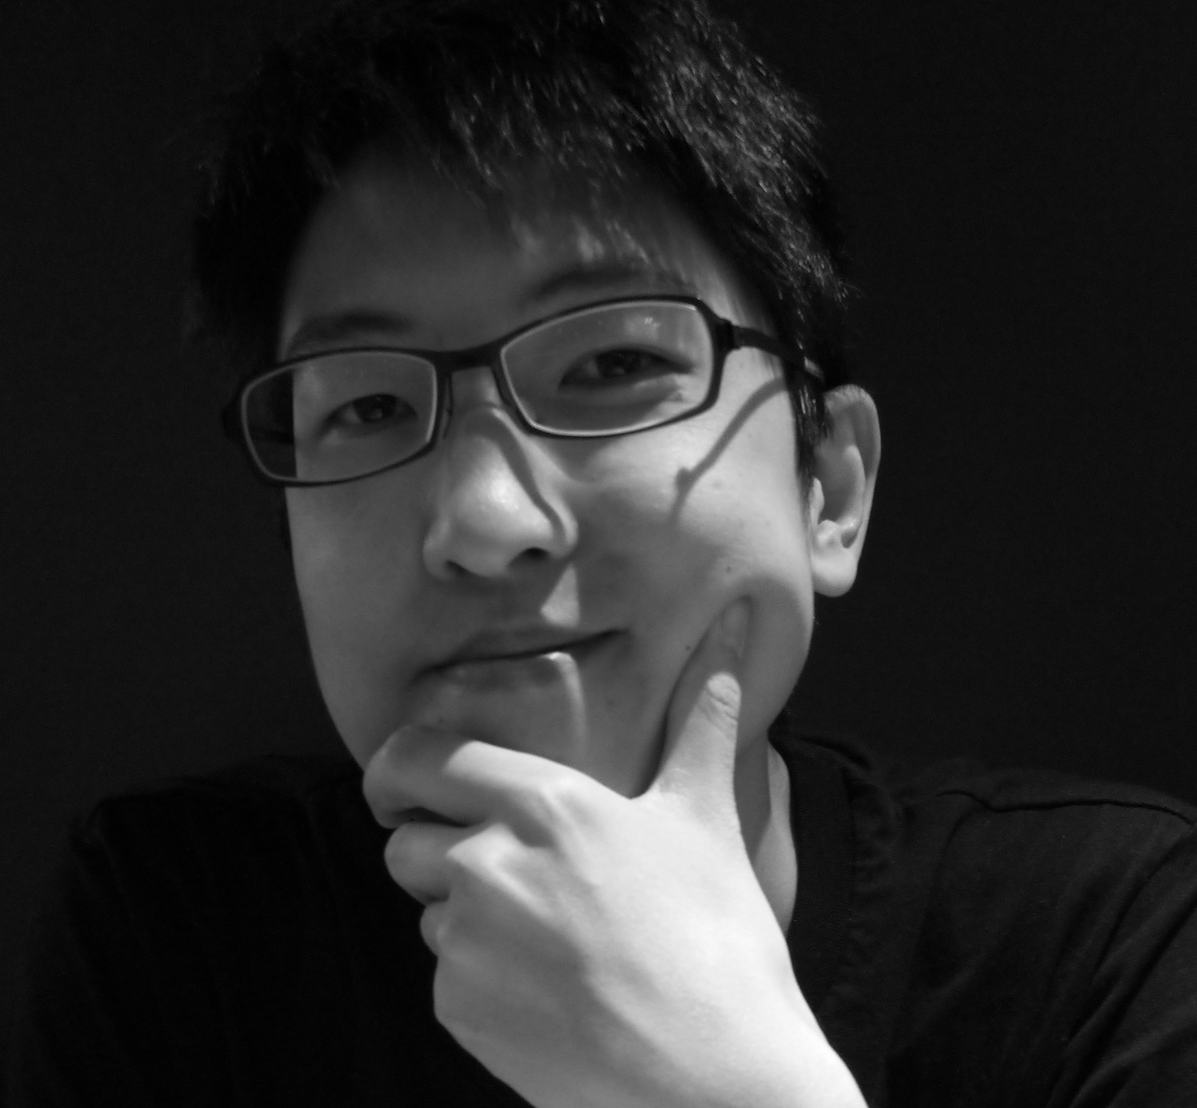 Jason Yuen